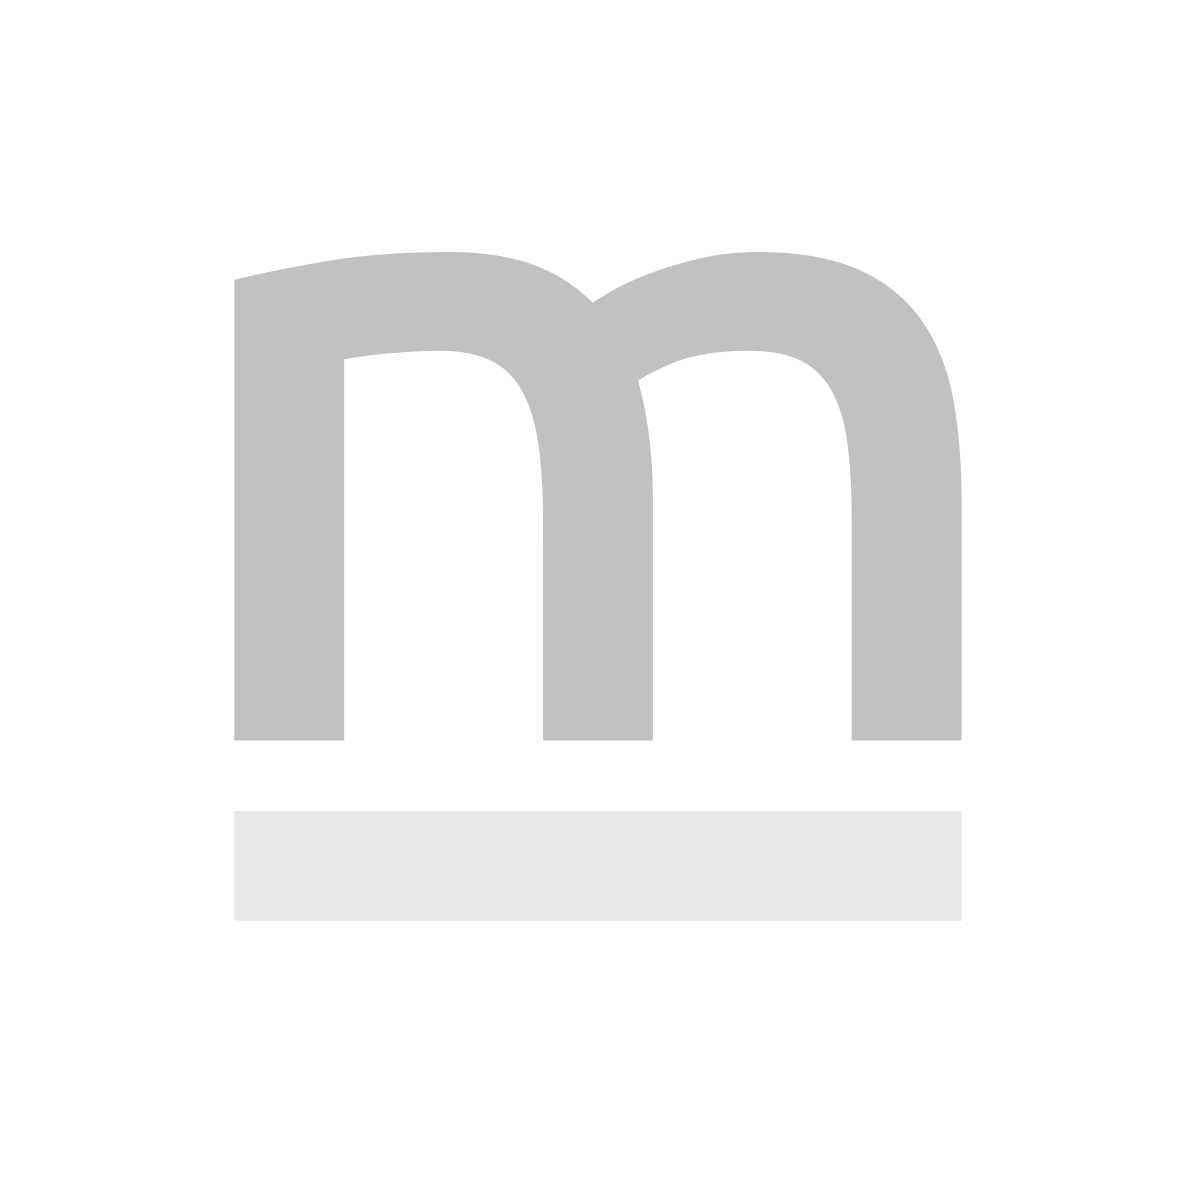 Krzesło CYPRIAN 2 BL VELVET GOLD ciemno szare